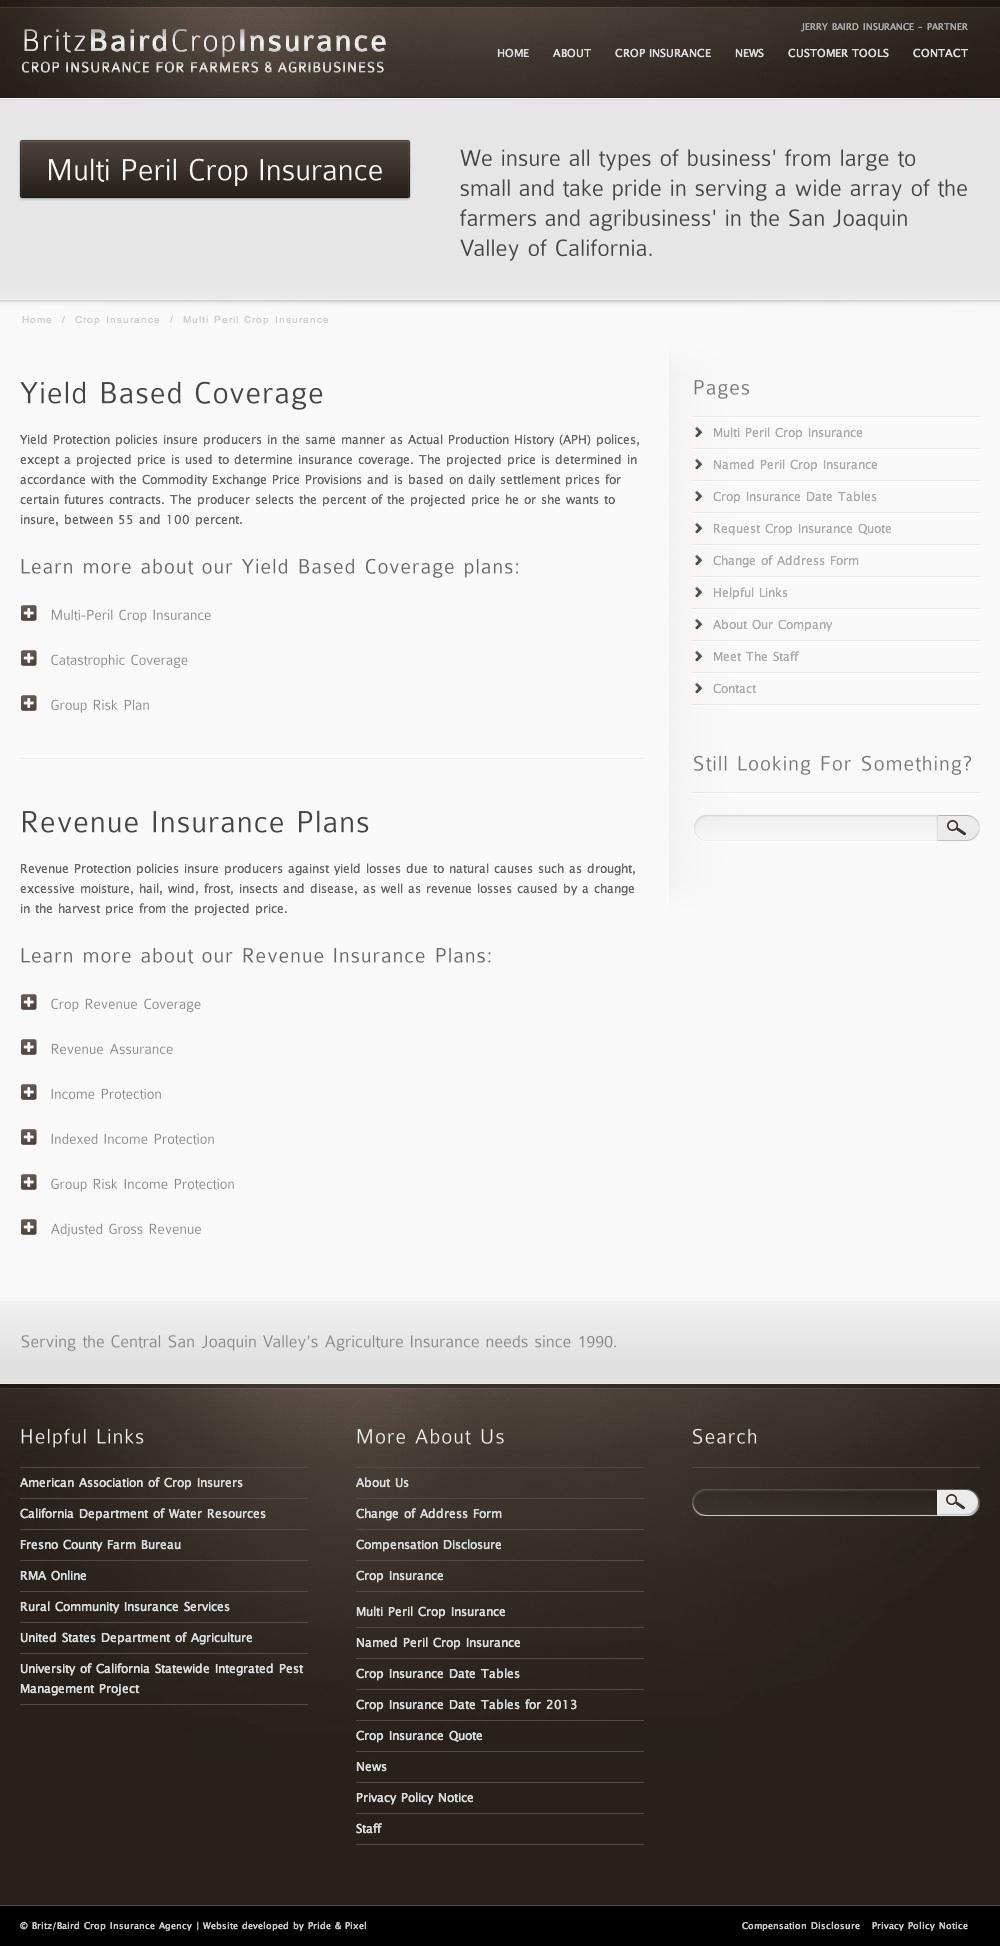 Britz Baird Insurance Multi Peril Crop